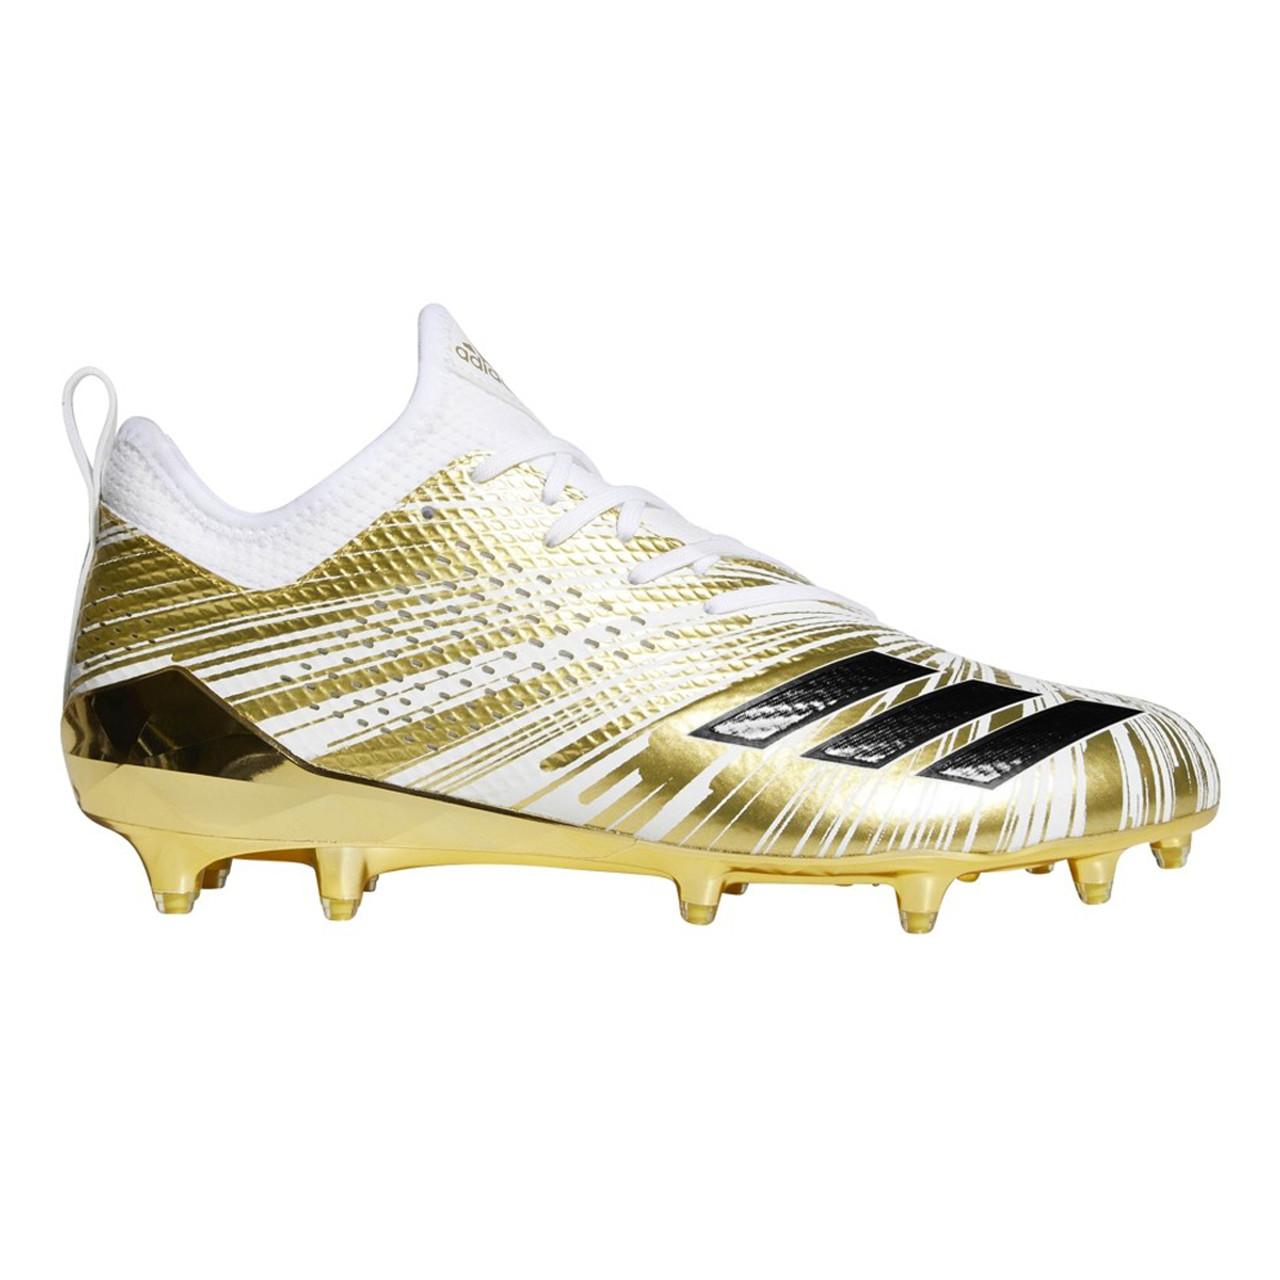 00912c93f061 Adidas Adizero 5-Star 7.0 Men's Football Cleats CQ0345 | Best Price